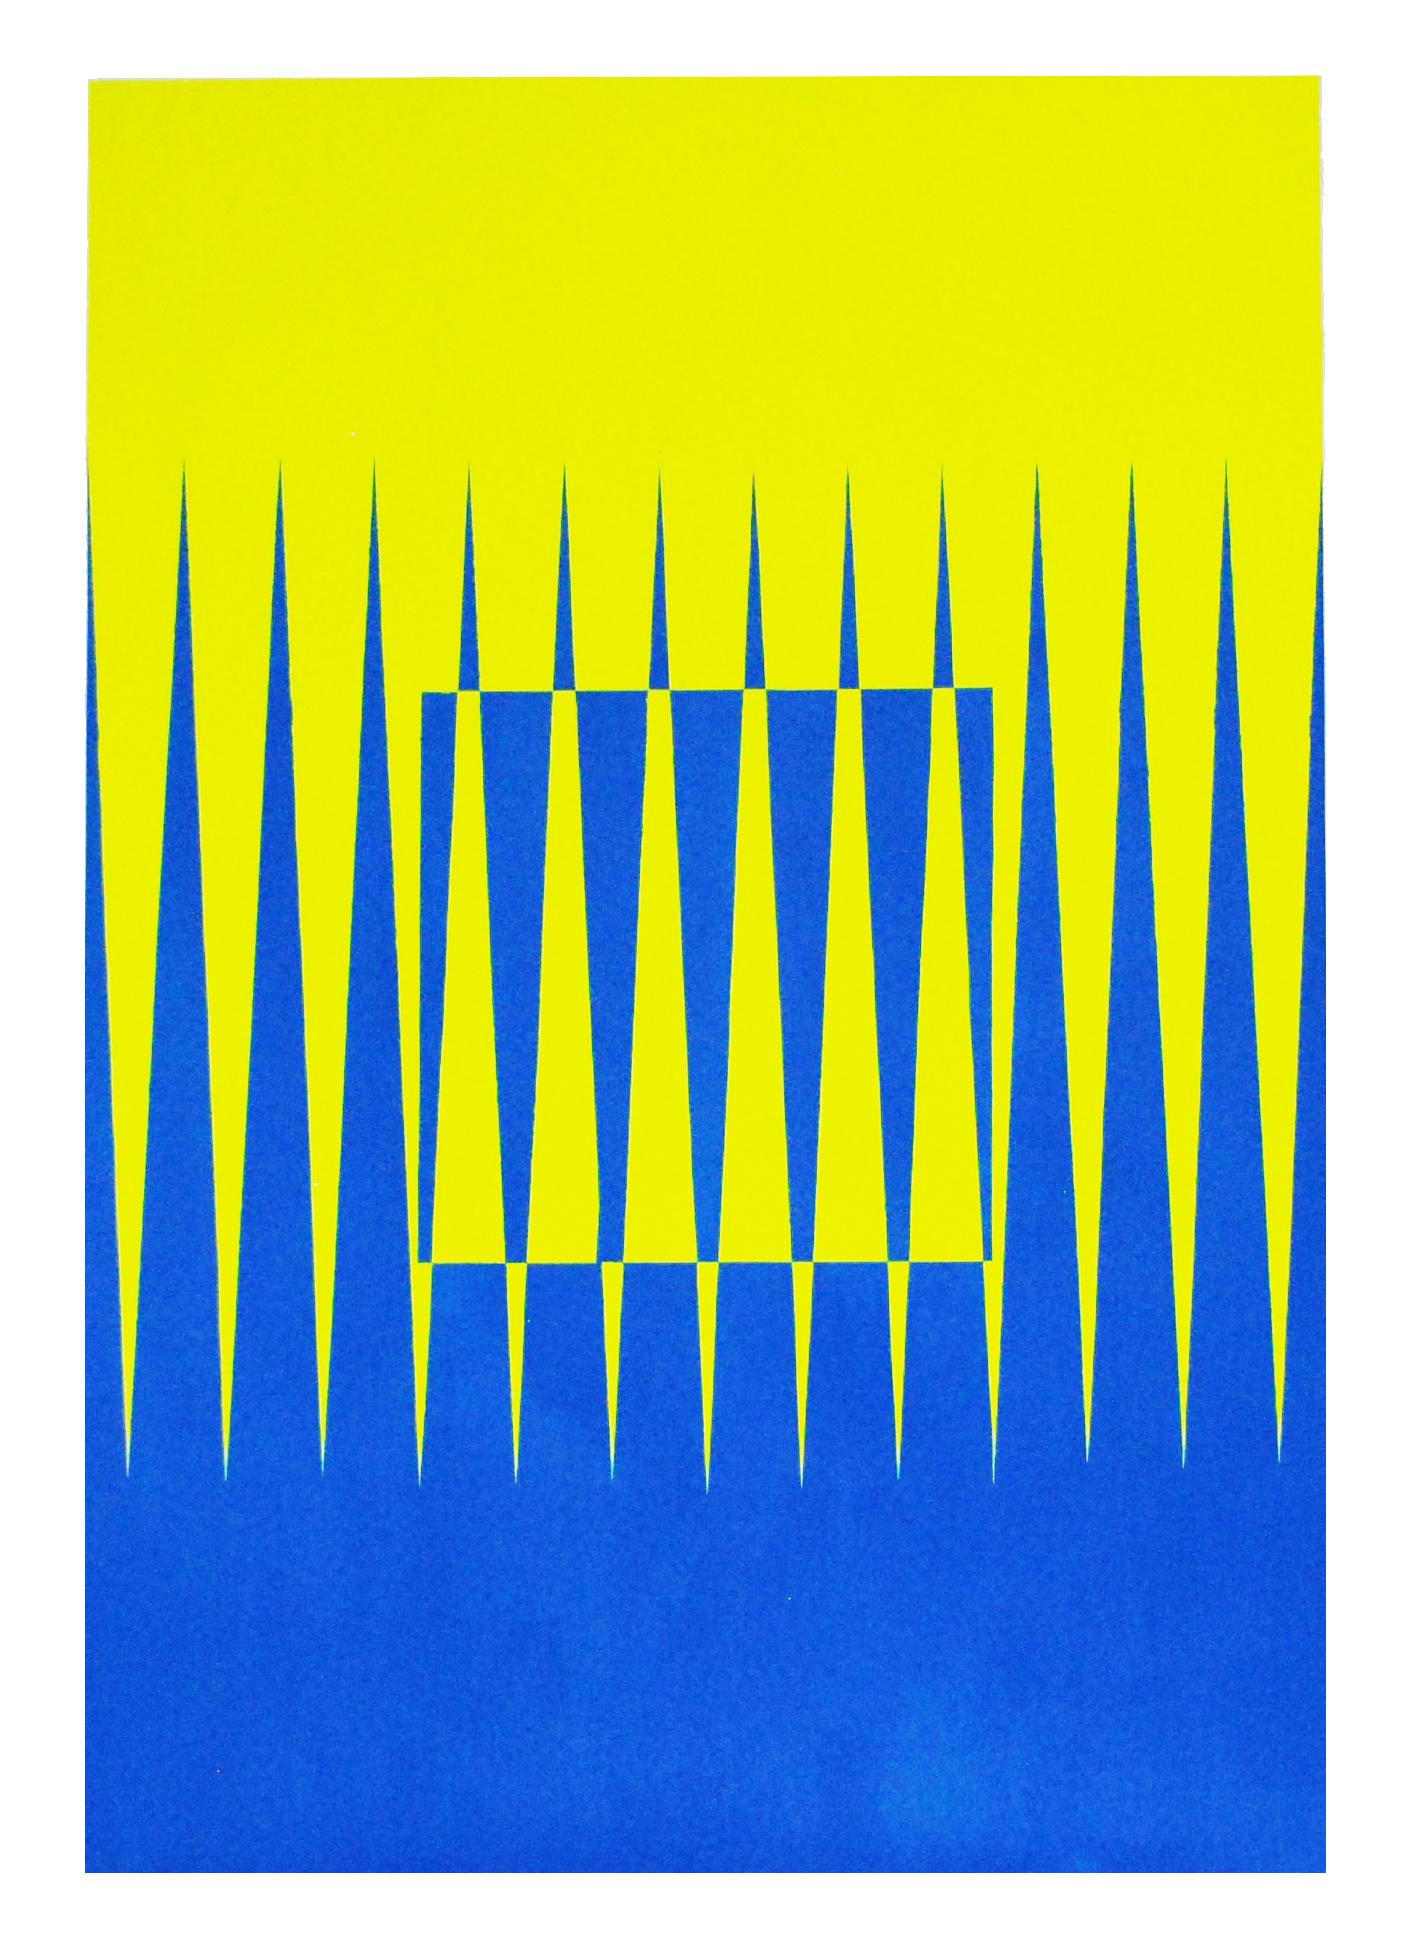 yellowblue_stripe2.jpg